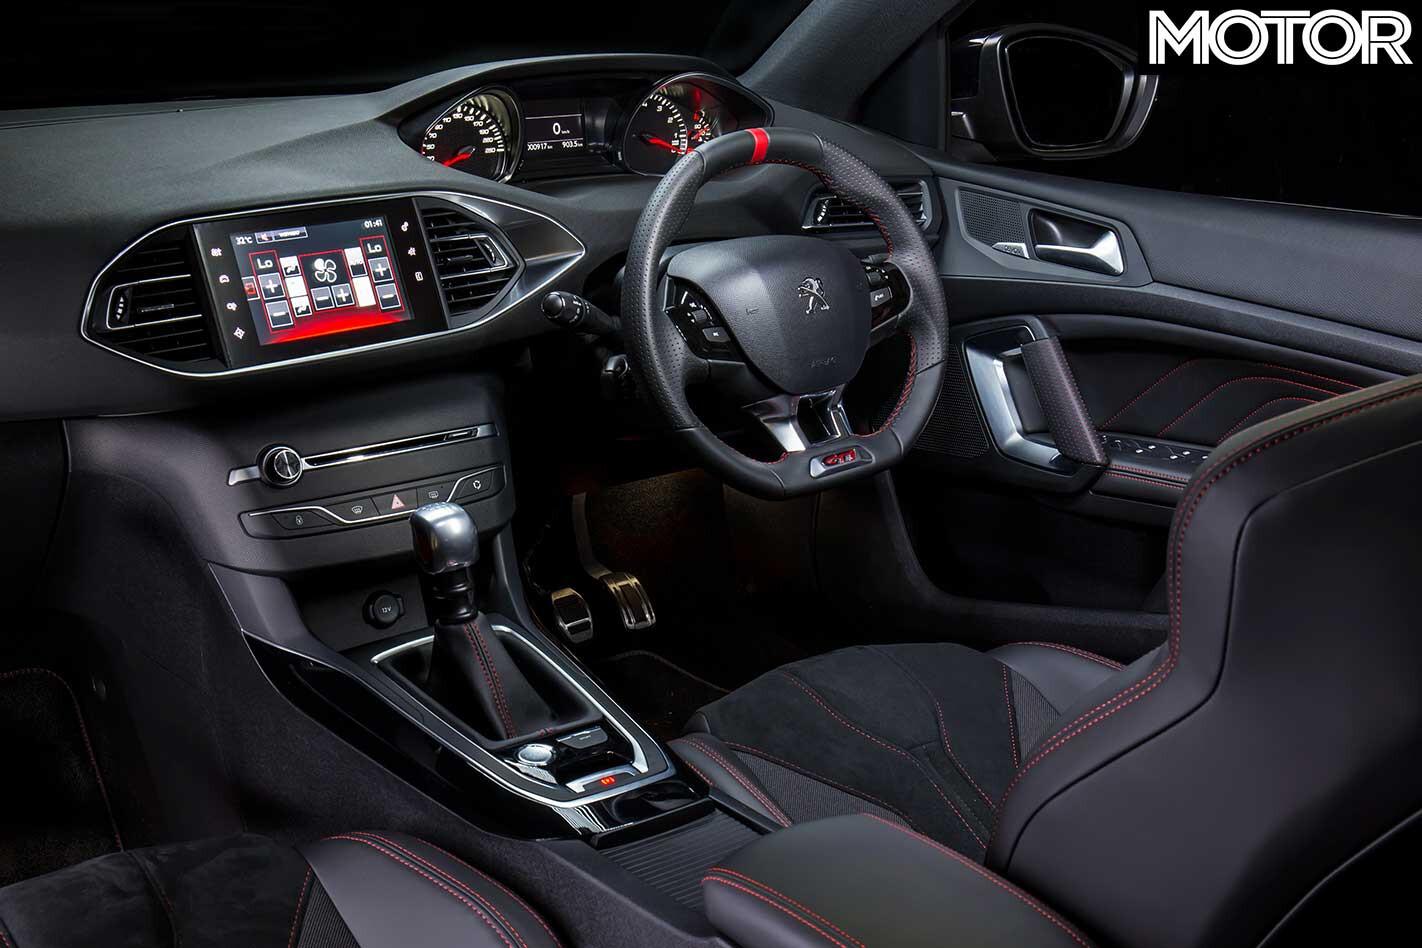 2018 Peugeot 308 Gti 270 Interior Jpg